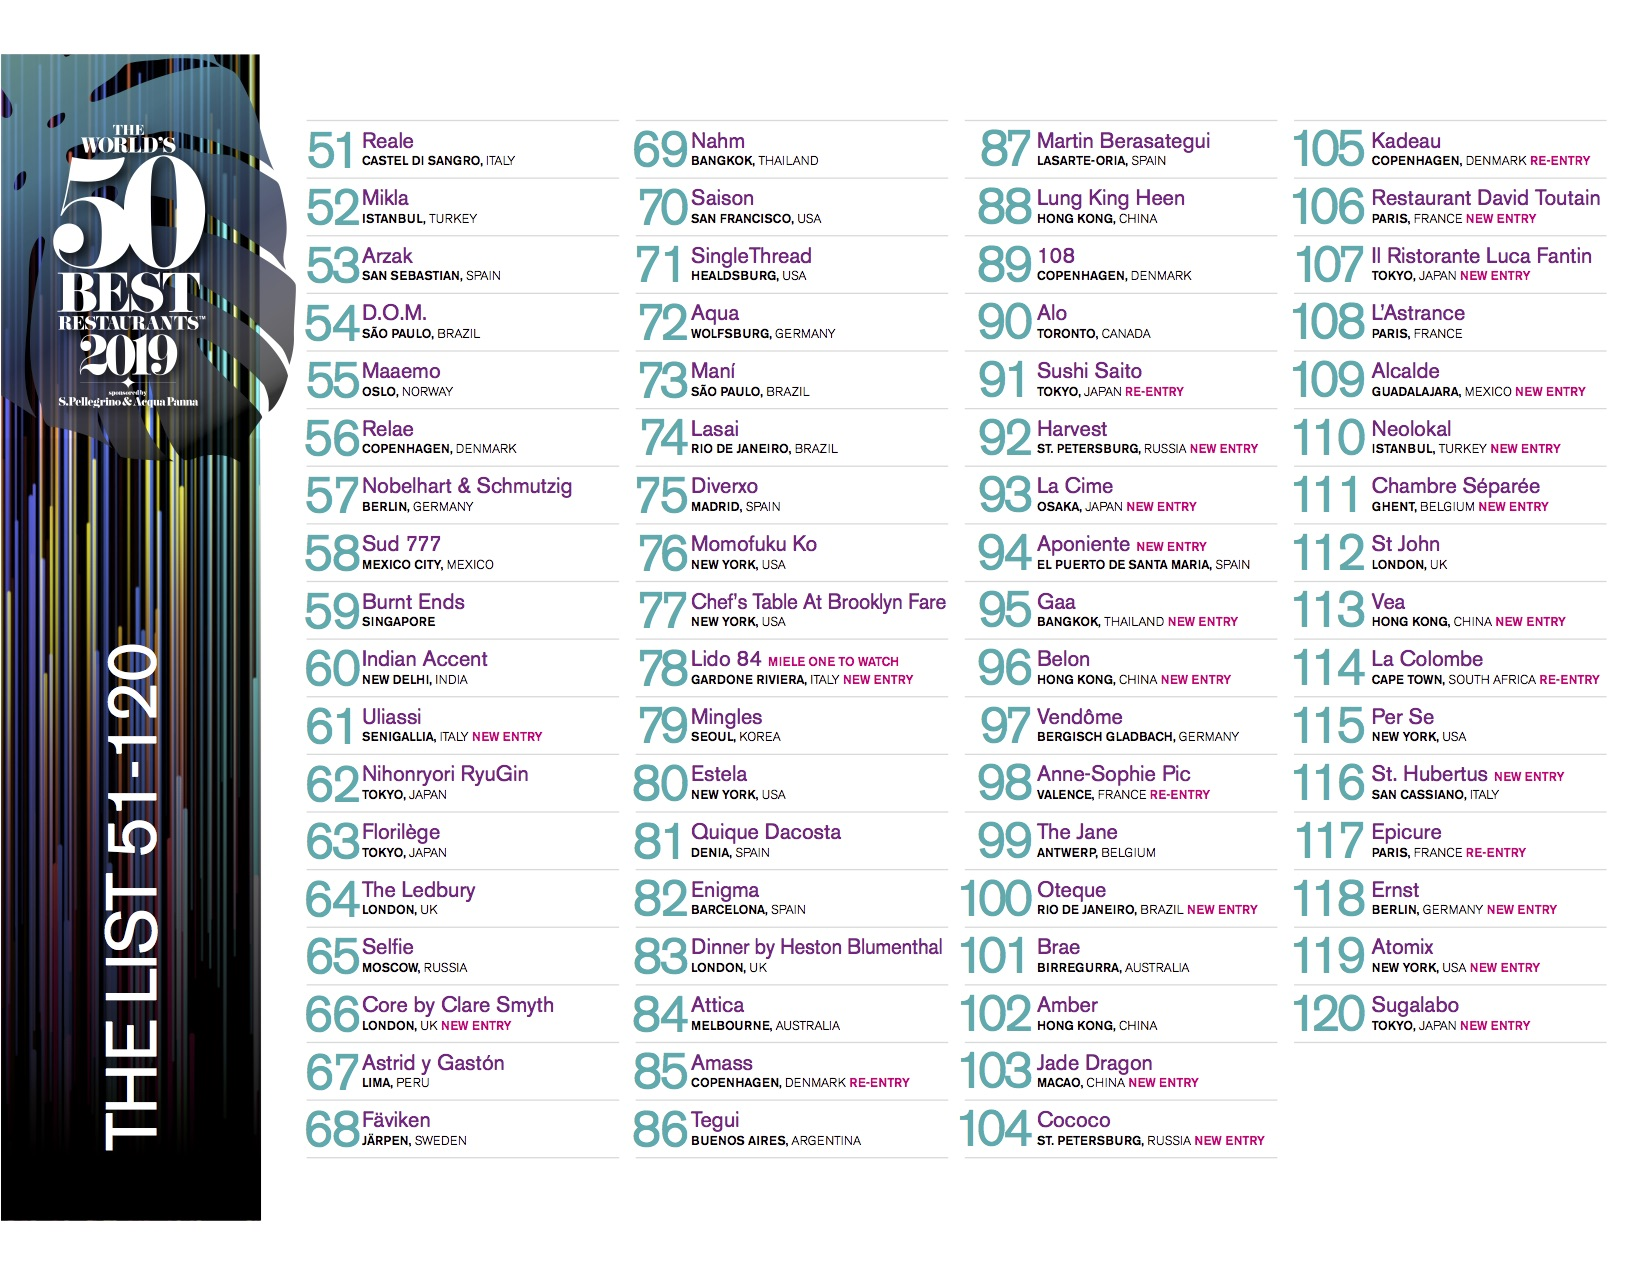 Saison Falls Out of World 50 Best Restaurant's Top 50 Ranking